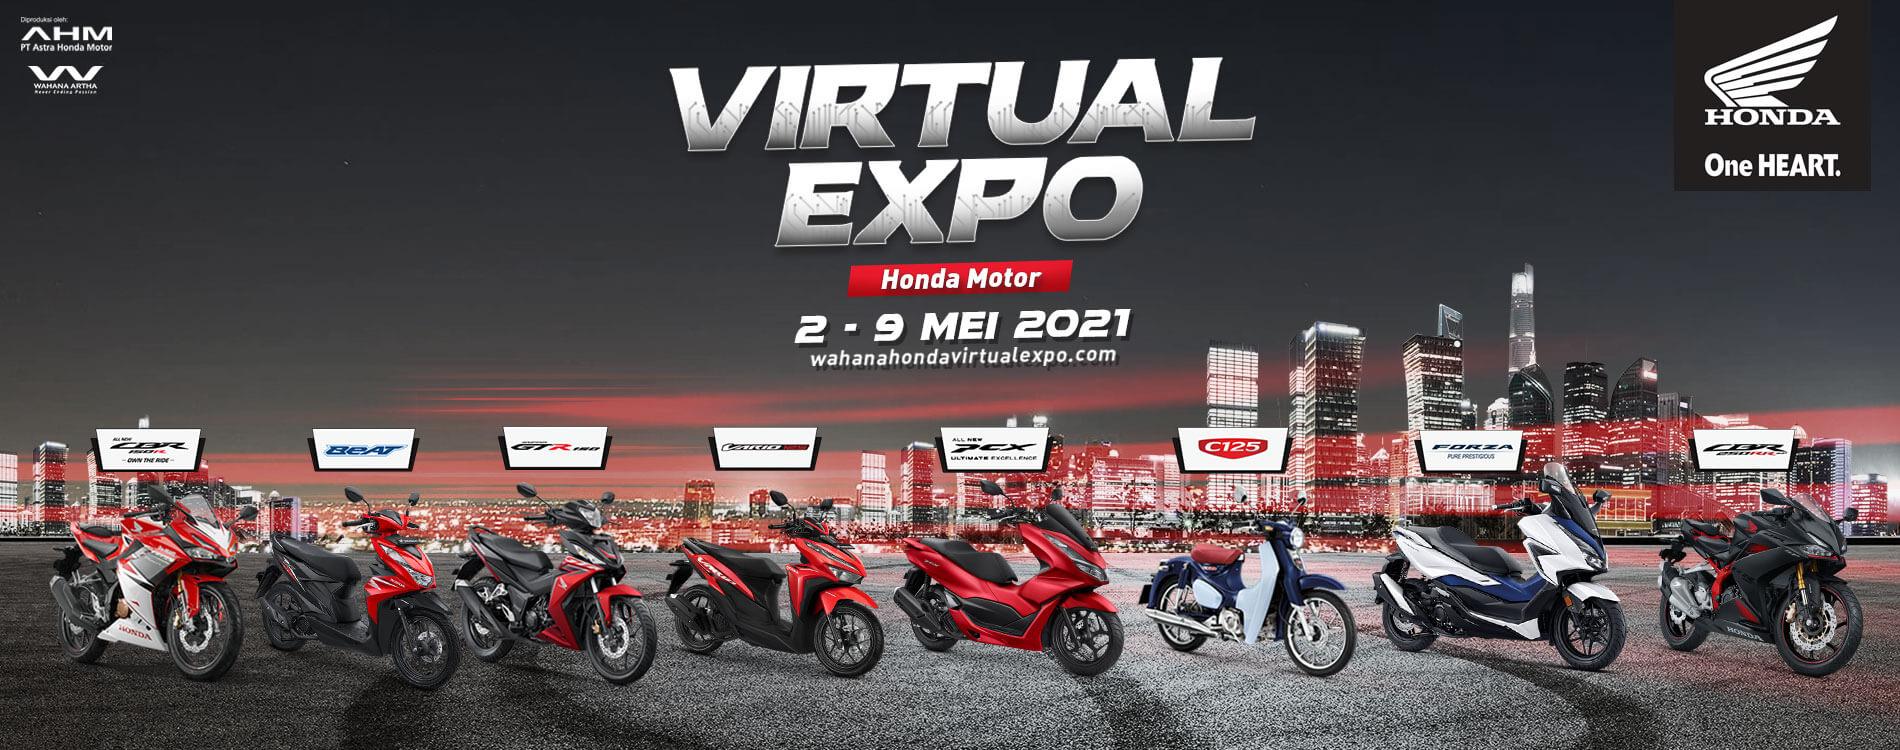 Virtual Expo Honda Motor 2 - 9 Mei 2021